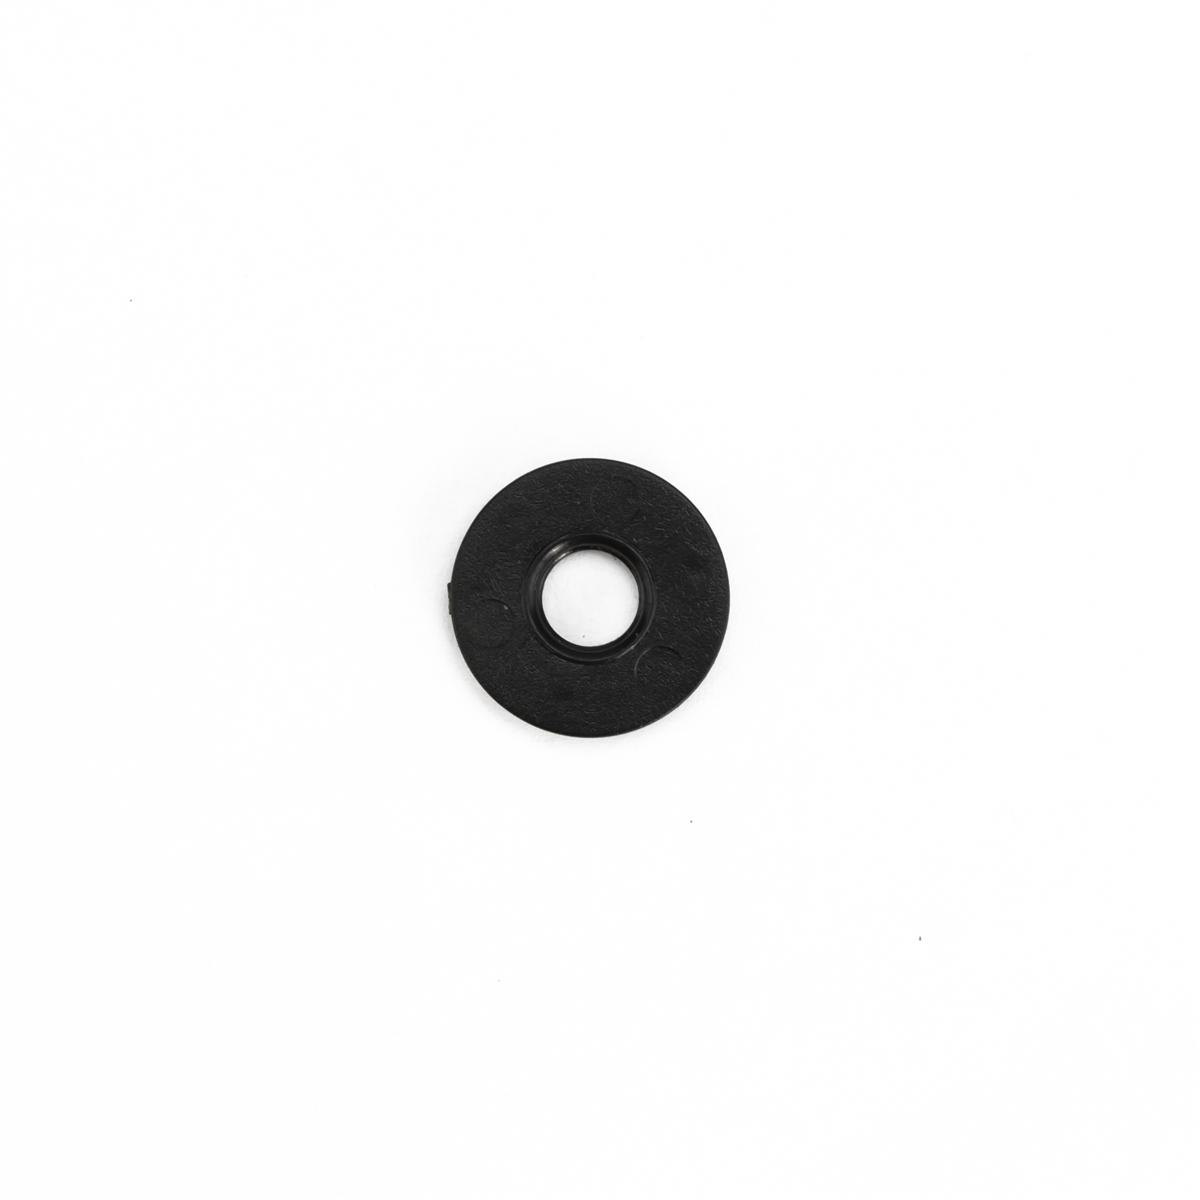 GE Corometrics Nautilus 2264HAX 2264LAX TOCO Transducer Plastic Insert for Metal Disc